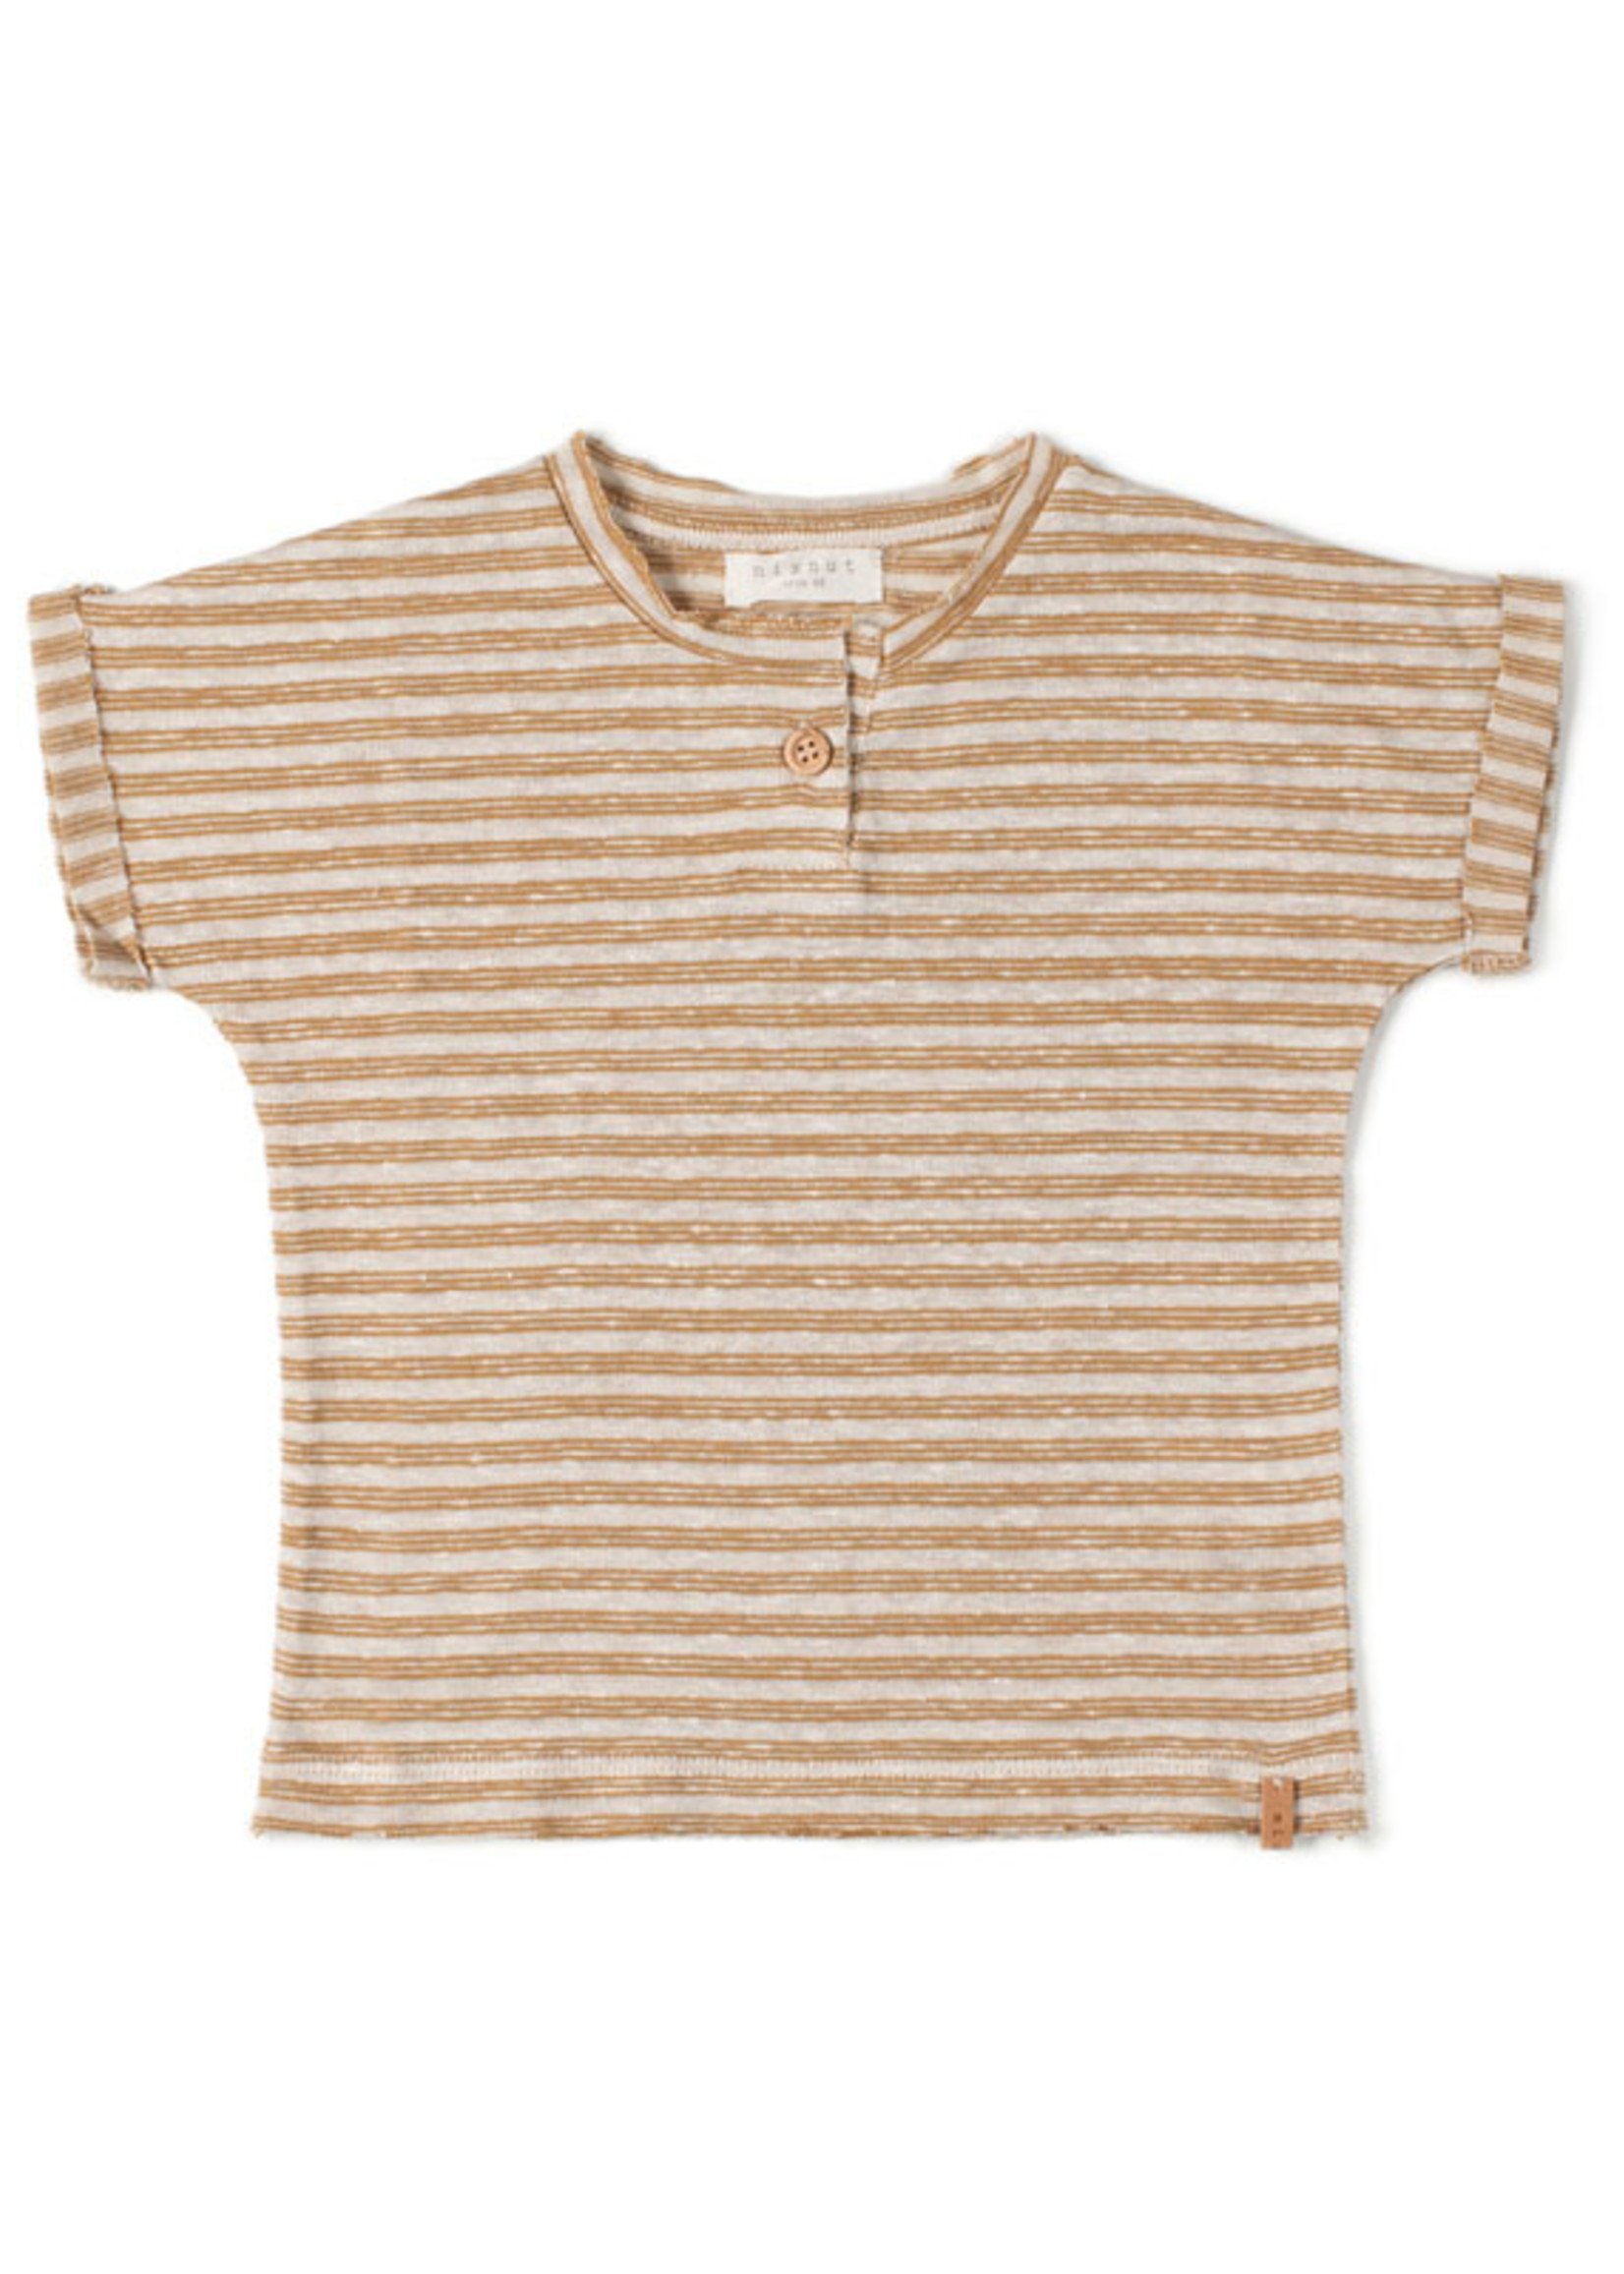 Nixnut Tshirt Stripe - Caramel